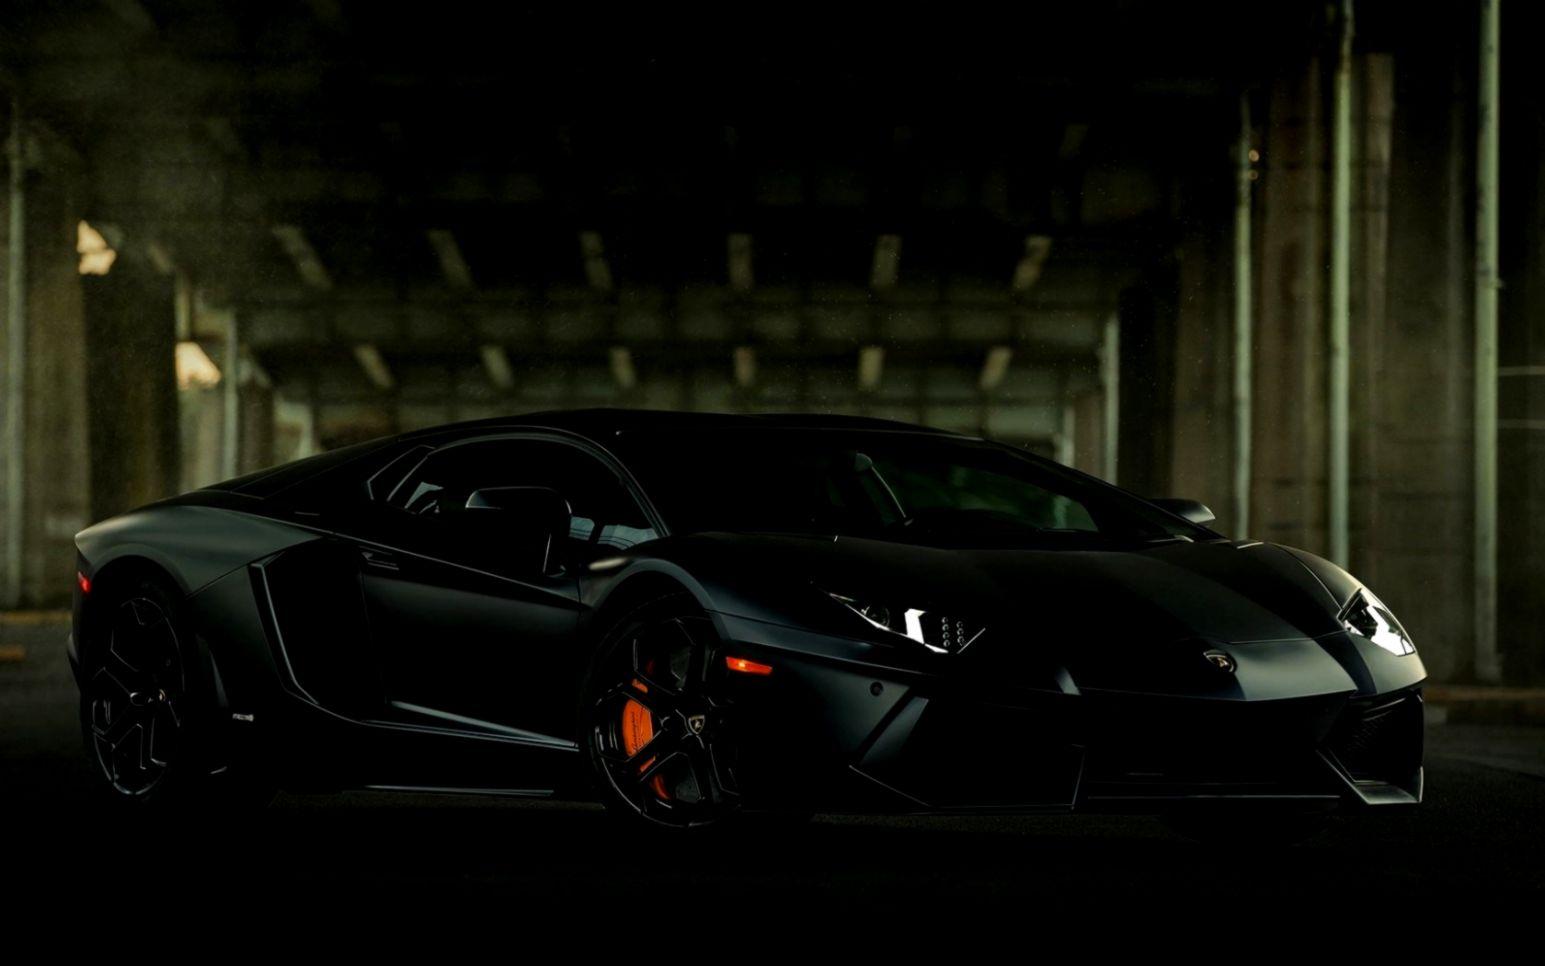 Best Lamborghini Aventador Wallpaper Hd Wallpaper Background Hd